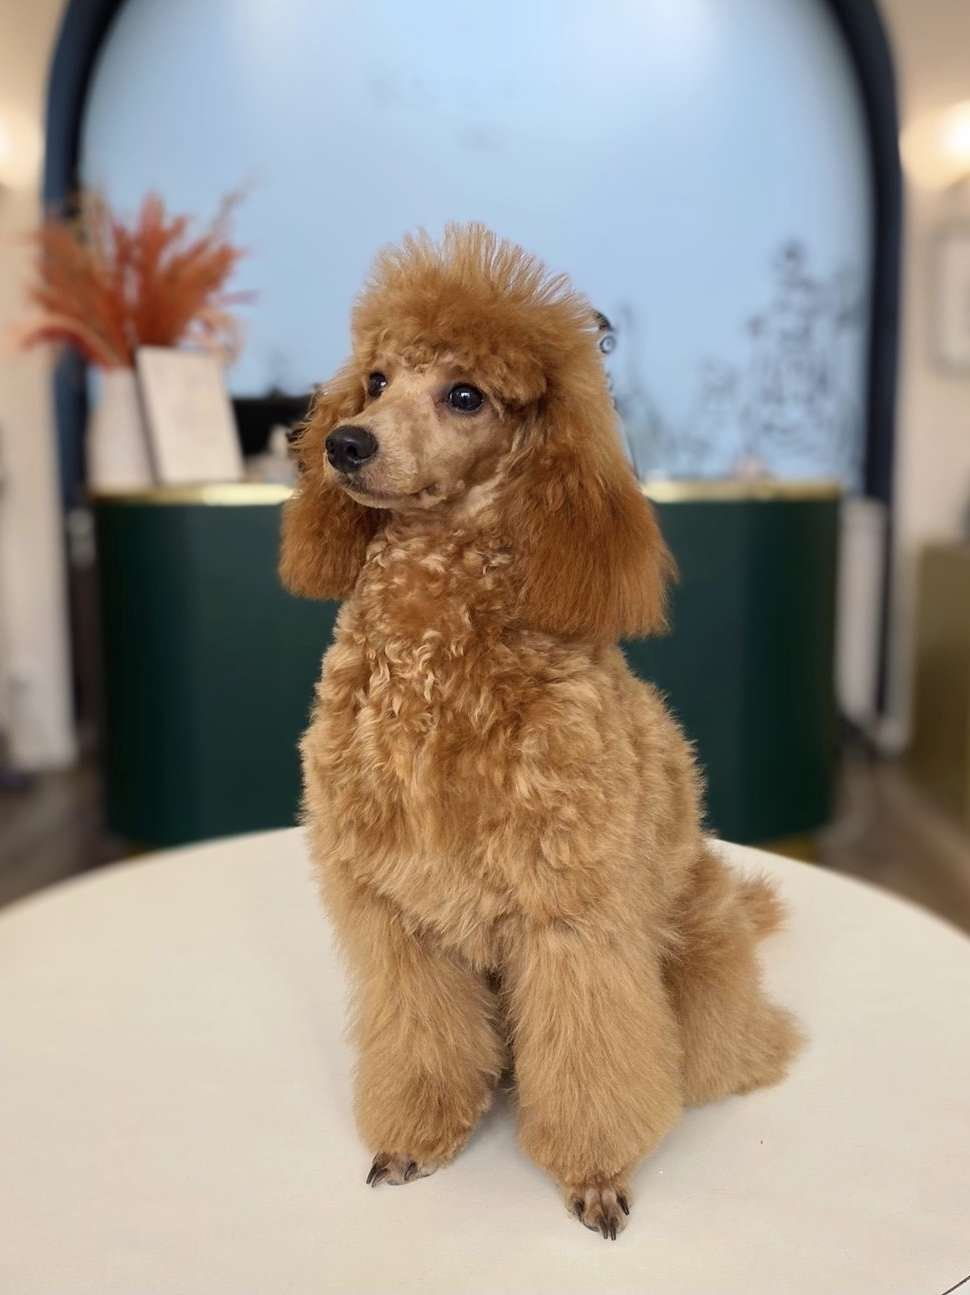 dog grooming salon in Paris, toilettage paris 6eme, dog grooming, dog care